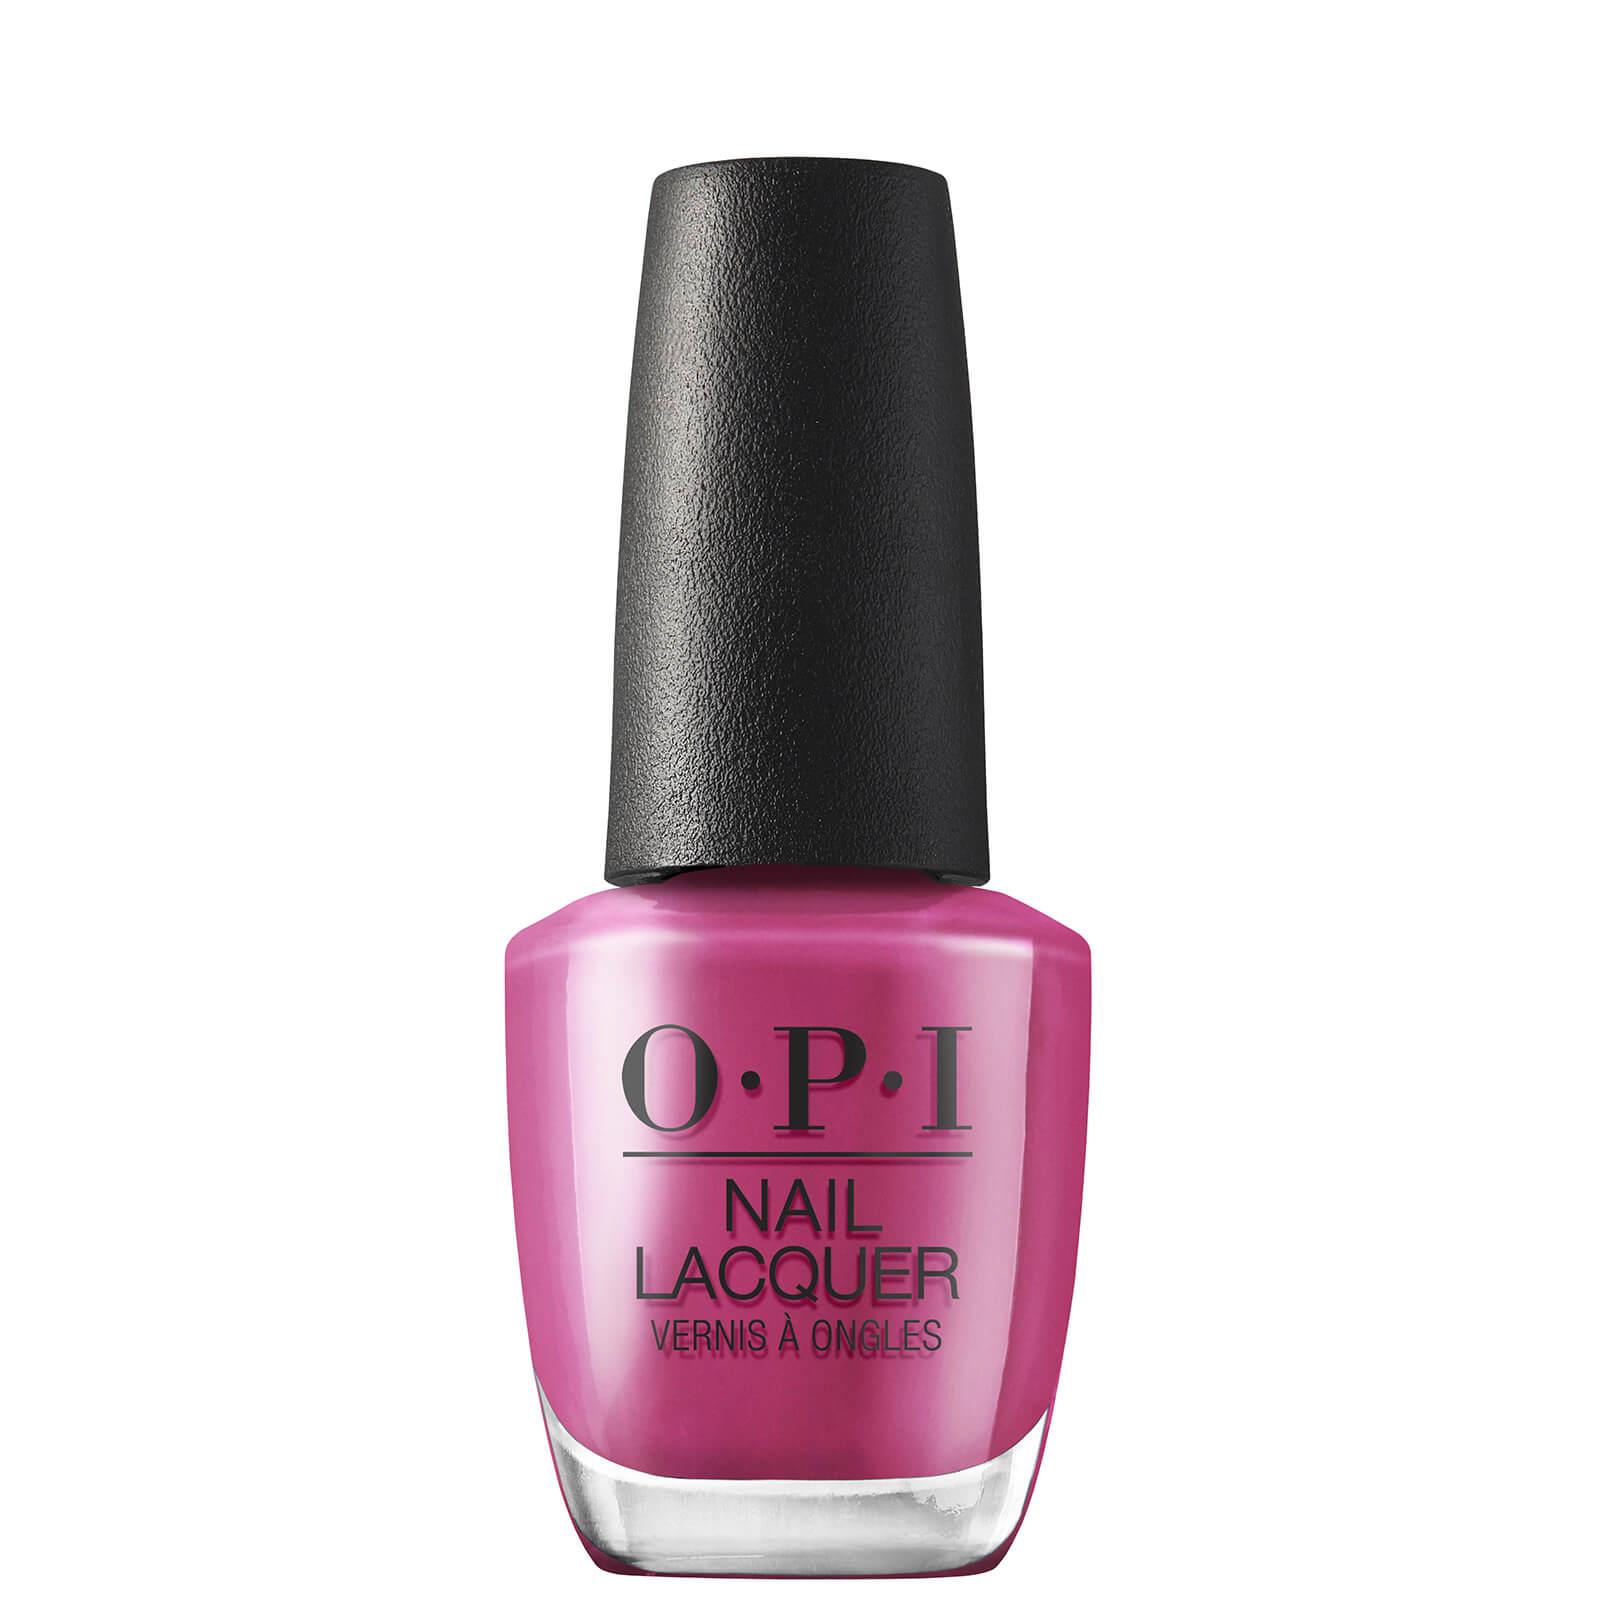 Купить OPI Nail Polish DTLA Collection 15ml (Various Shades) - 7th and Flower